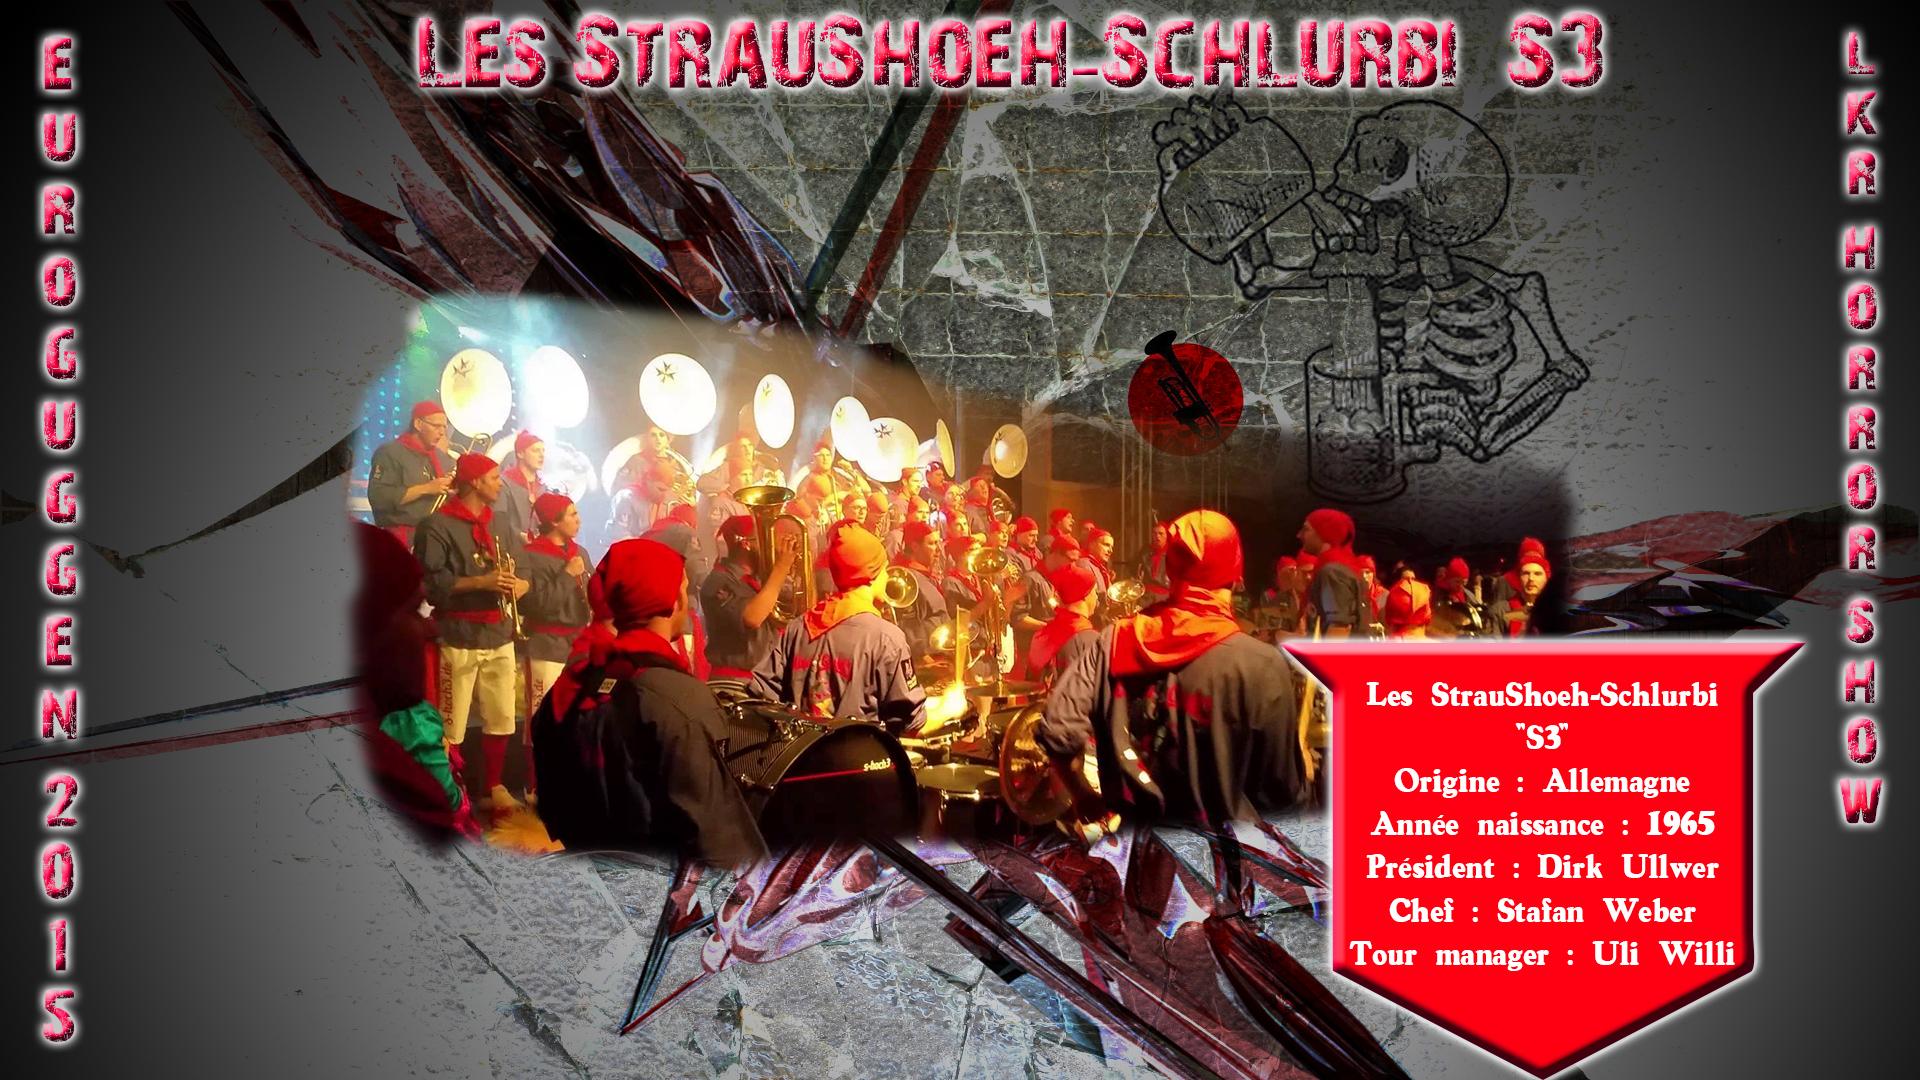 Les StrauShoeh-Schlurbi S3